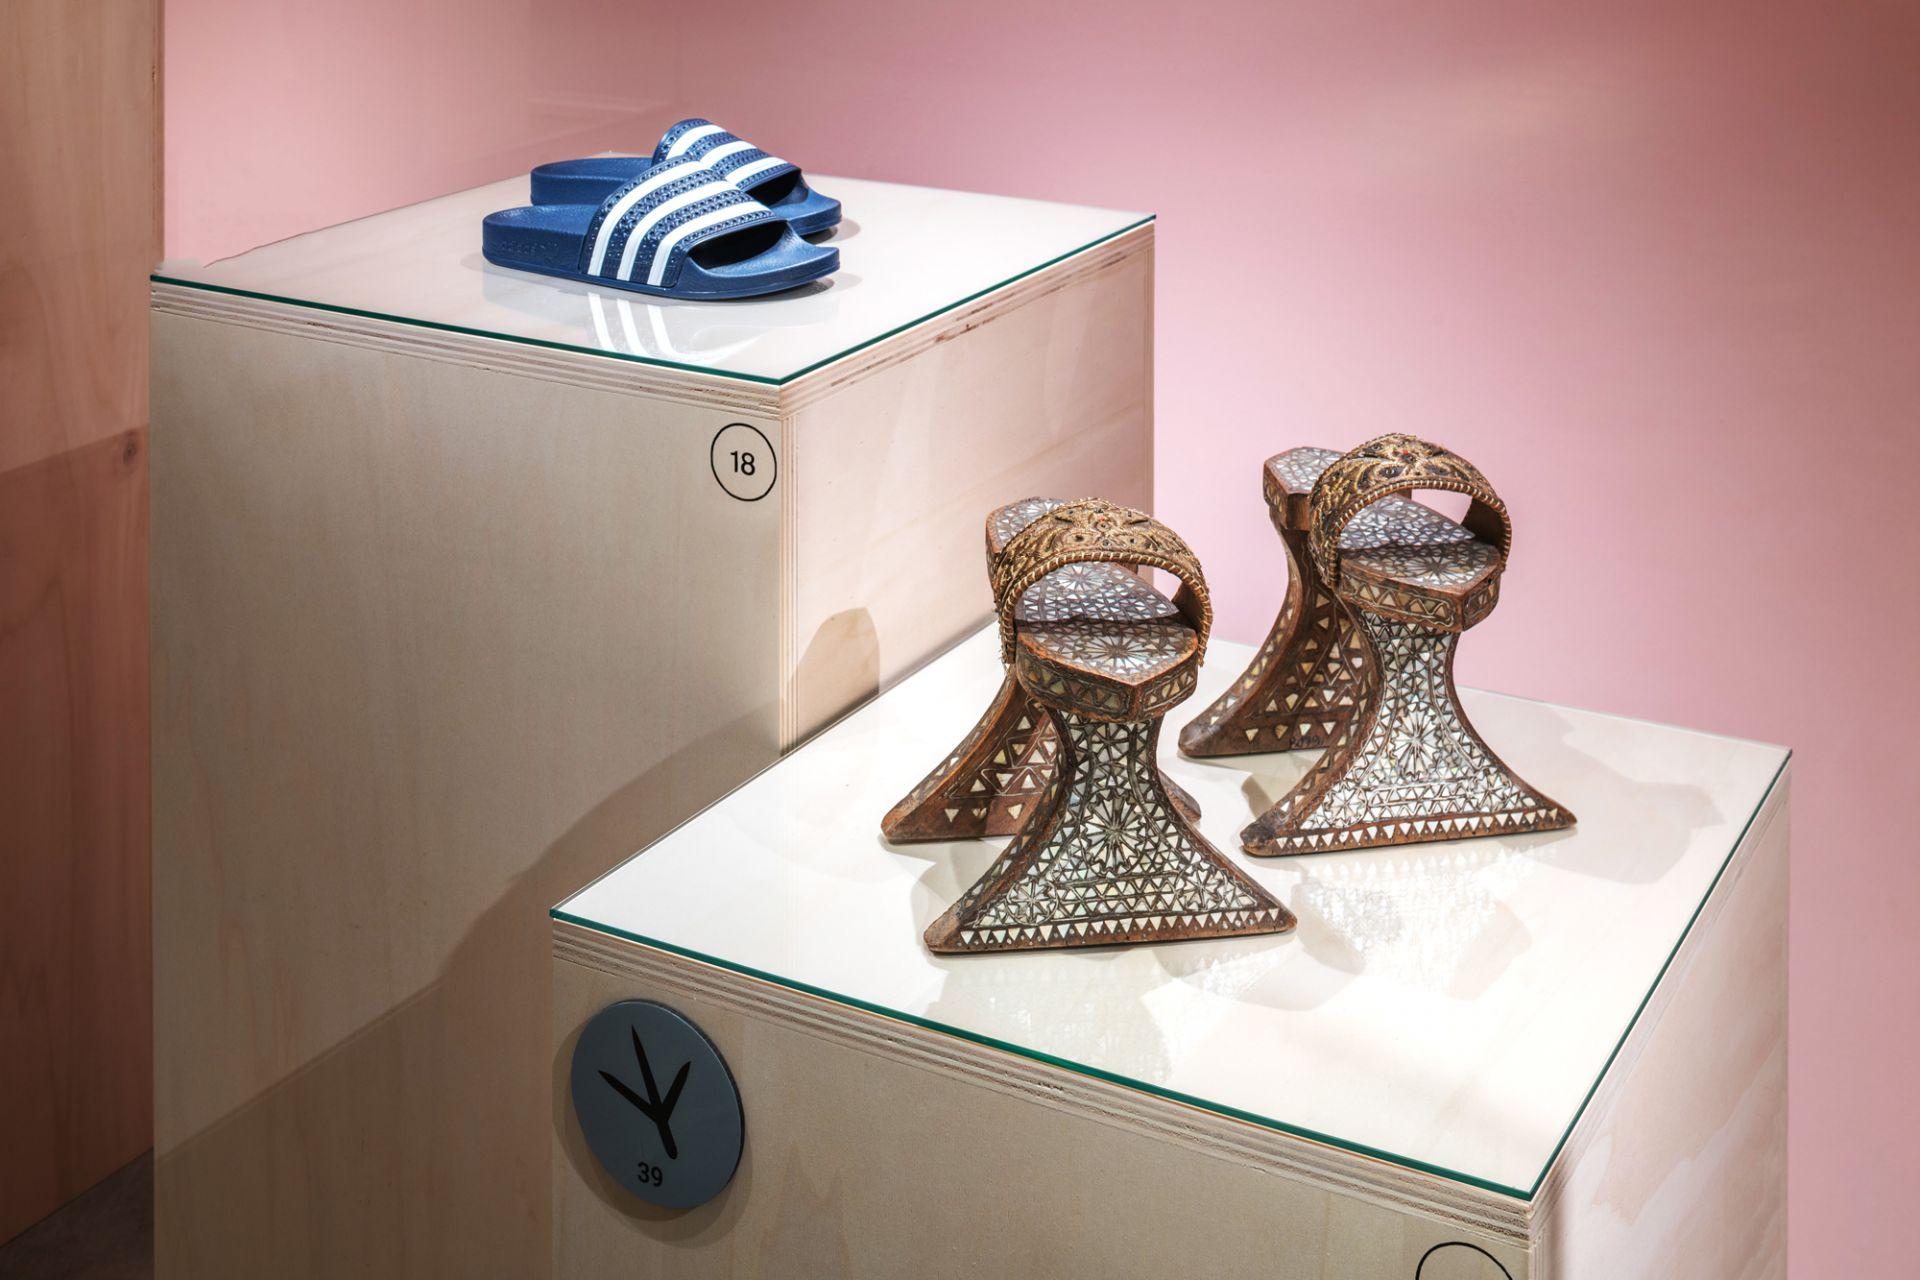 Stilted sandal, Damascus, Syria, 19th century and cross-strap sandals, Adilette, adidas, Herzogenaurach, 2019